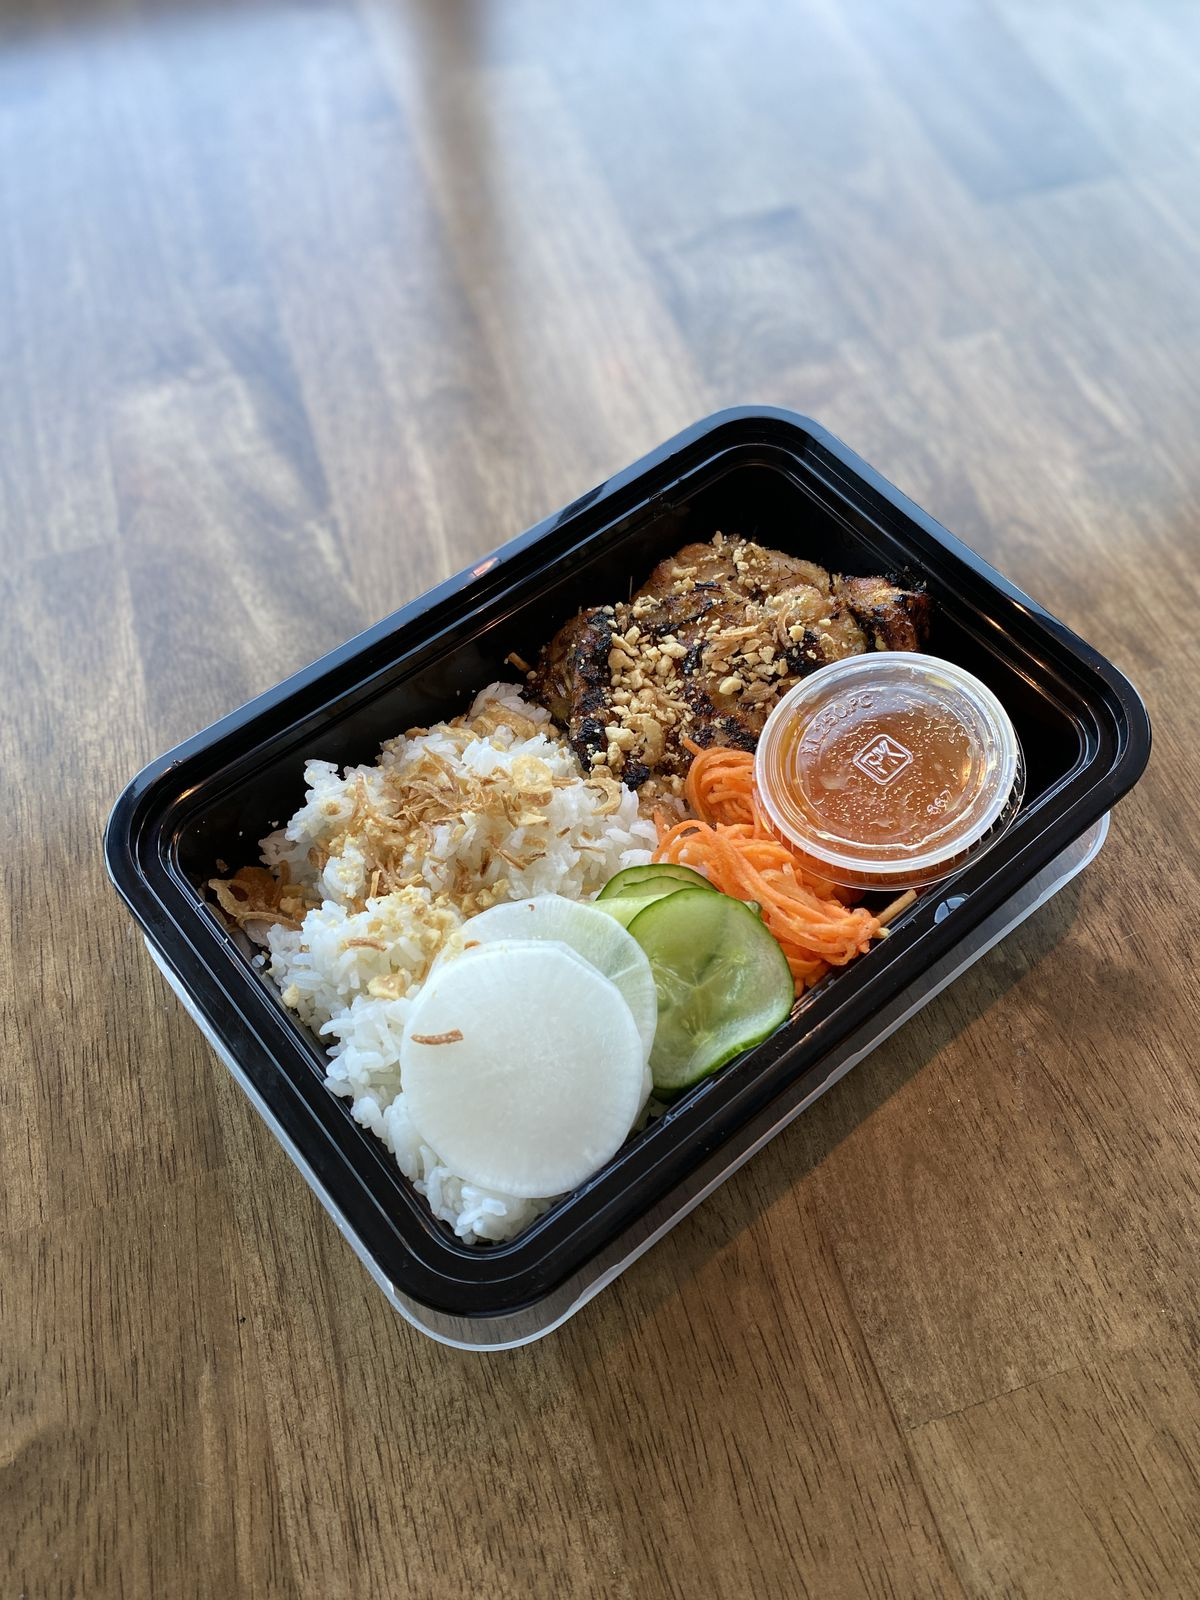 A lemongrass chicken rice bowl from Emilie's